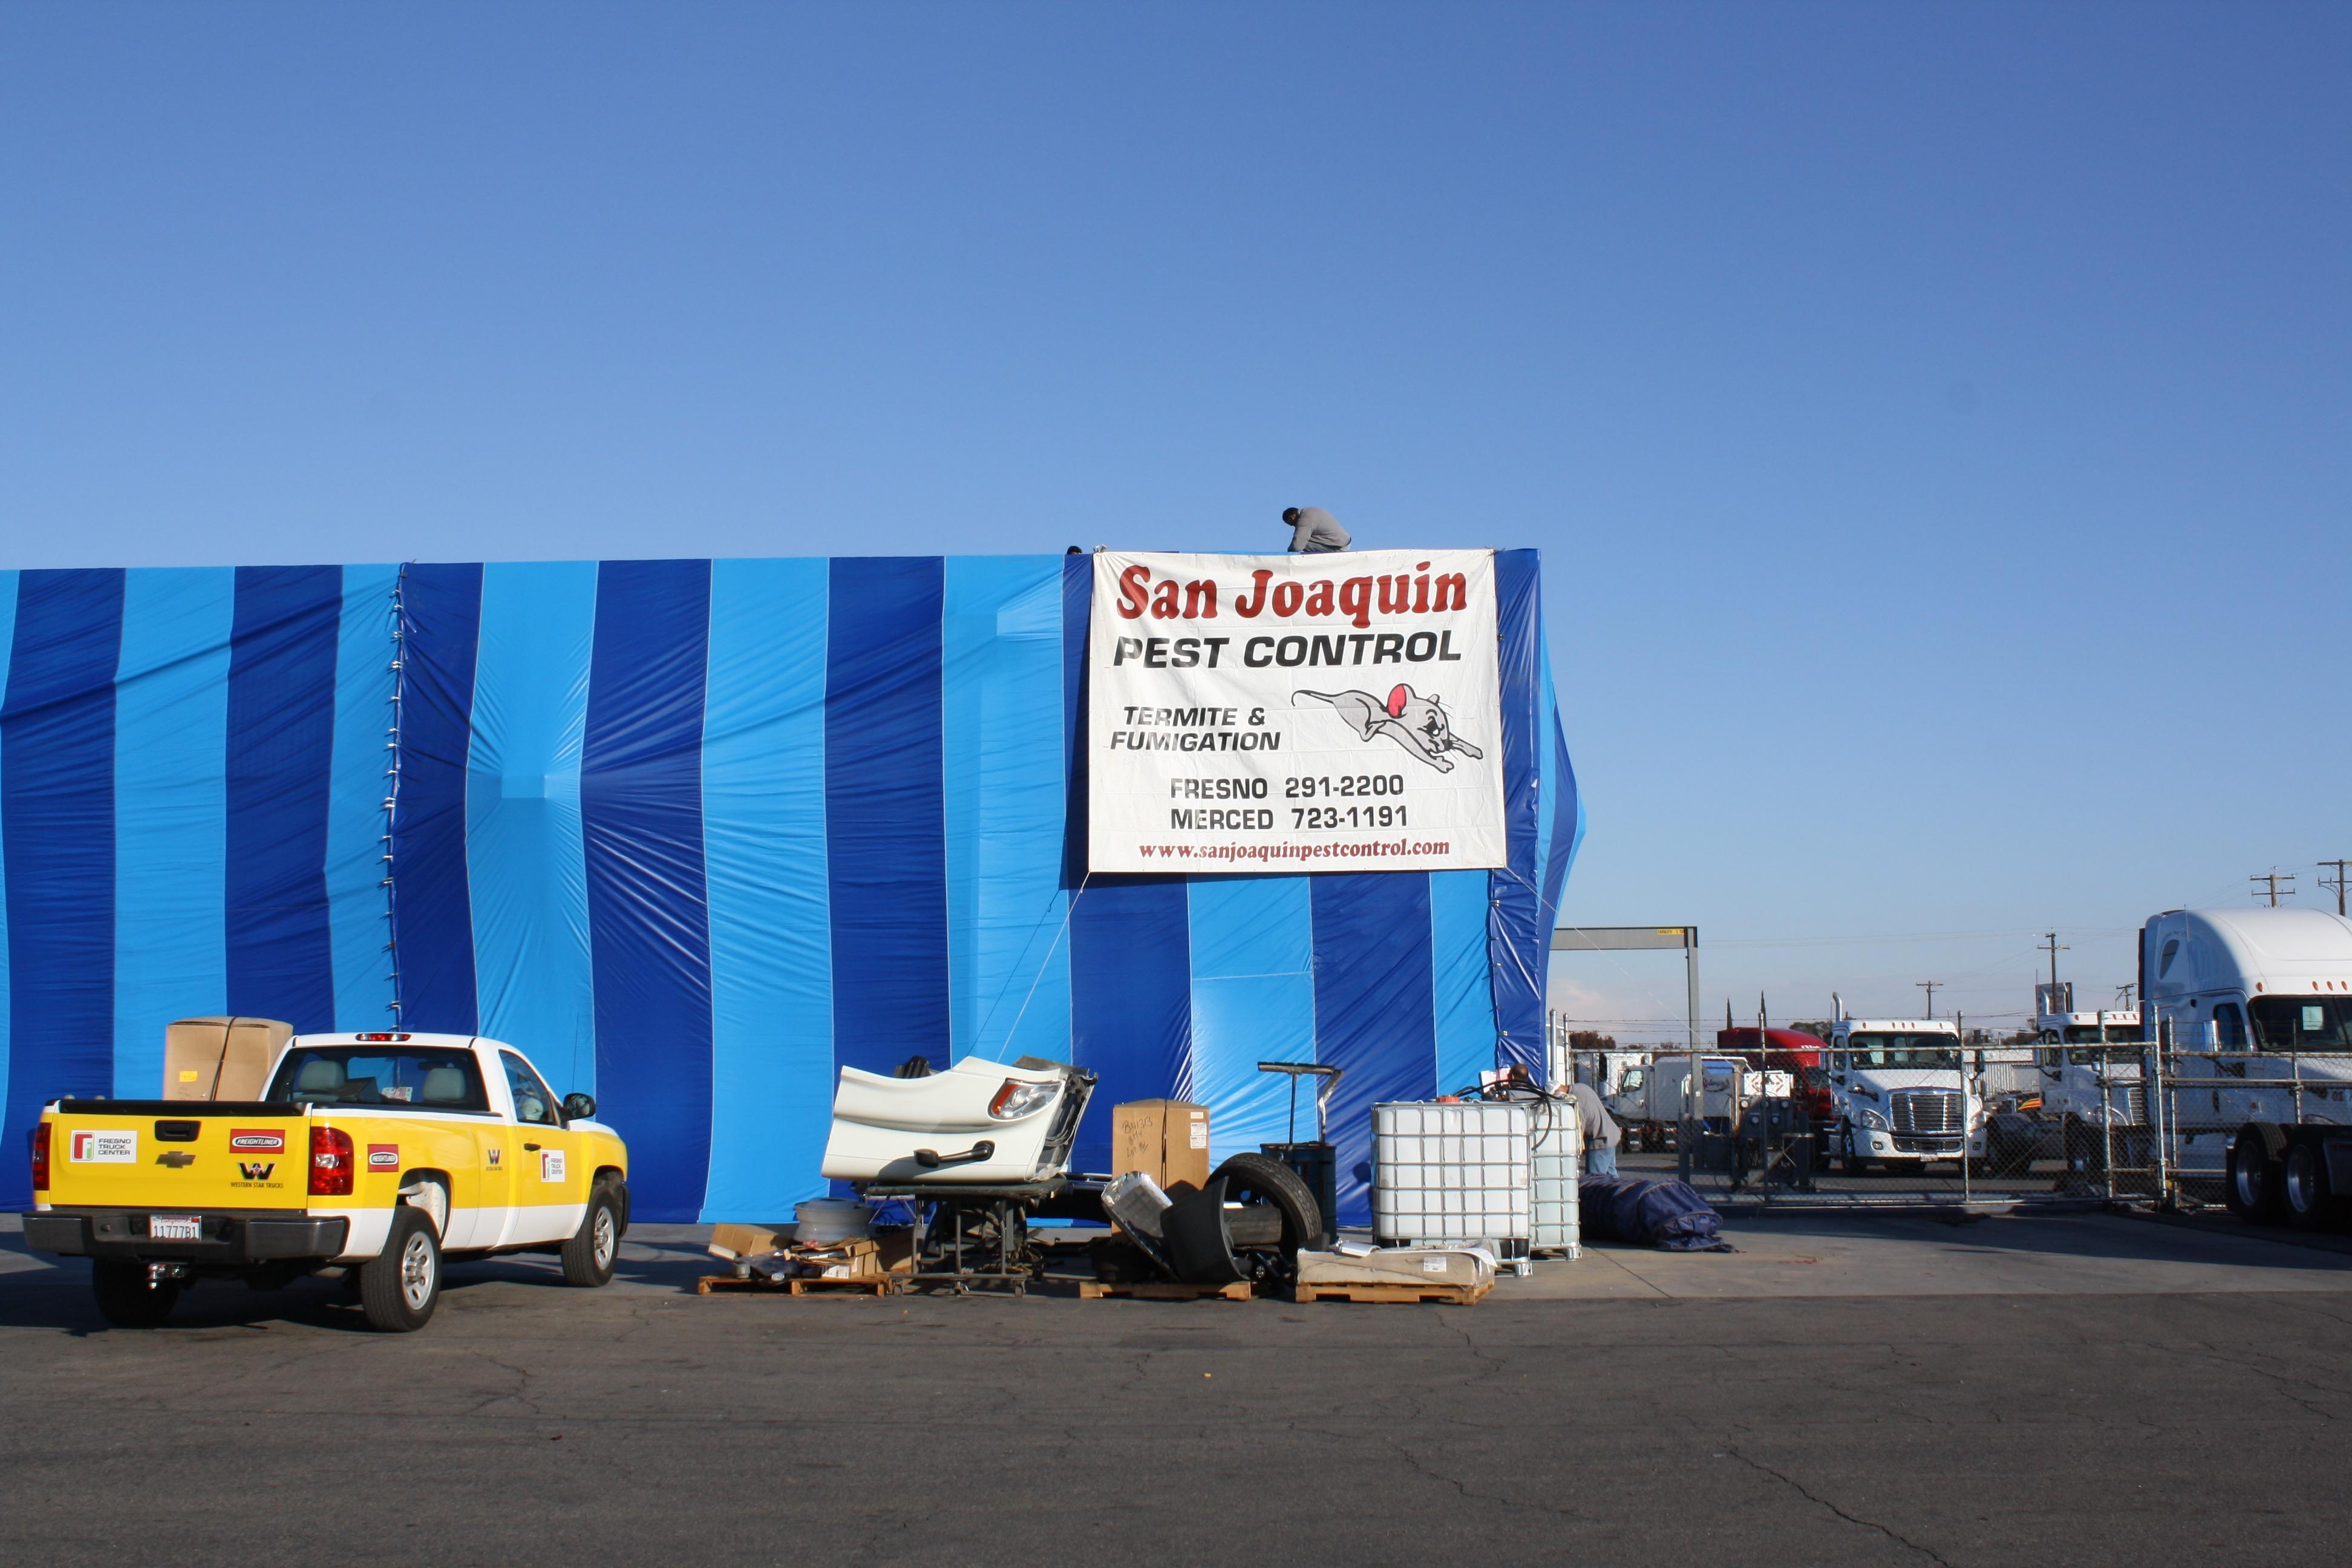 San joaquin pest control fresno ca business directory for California company directory